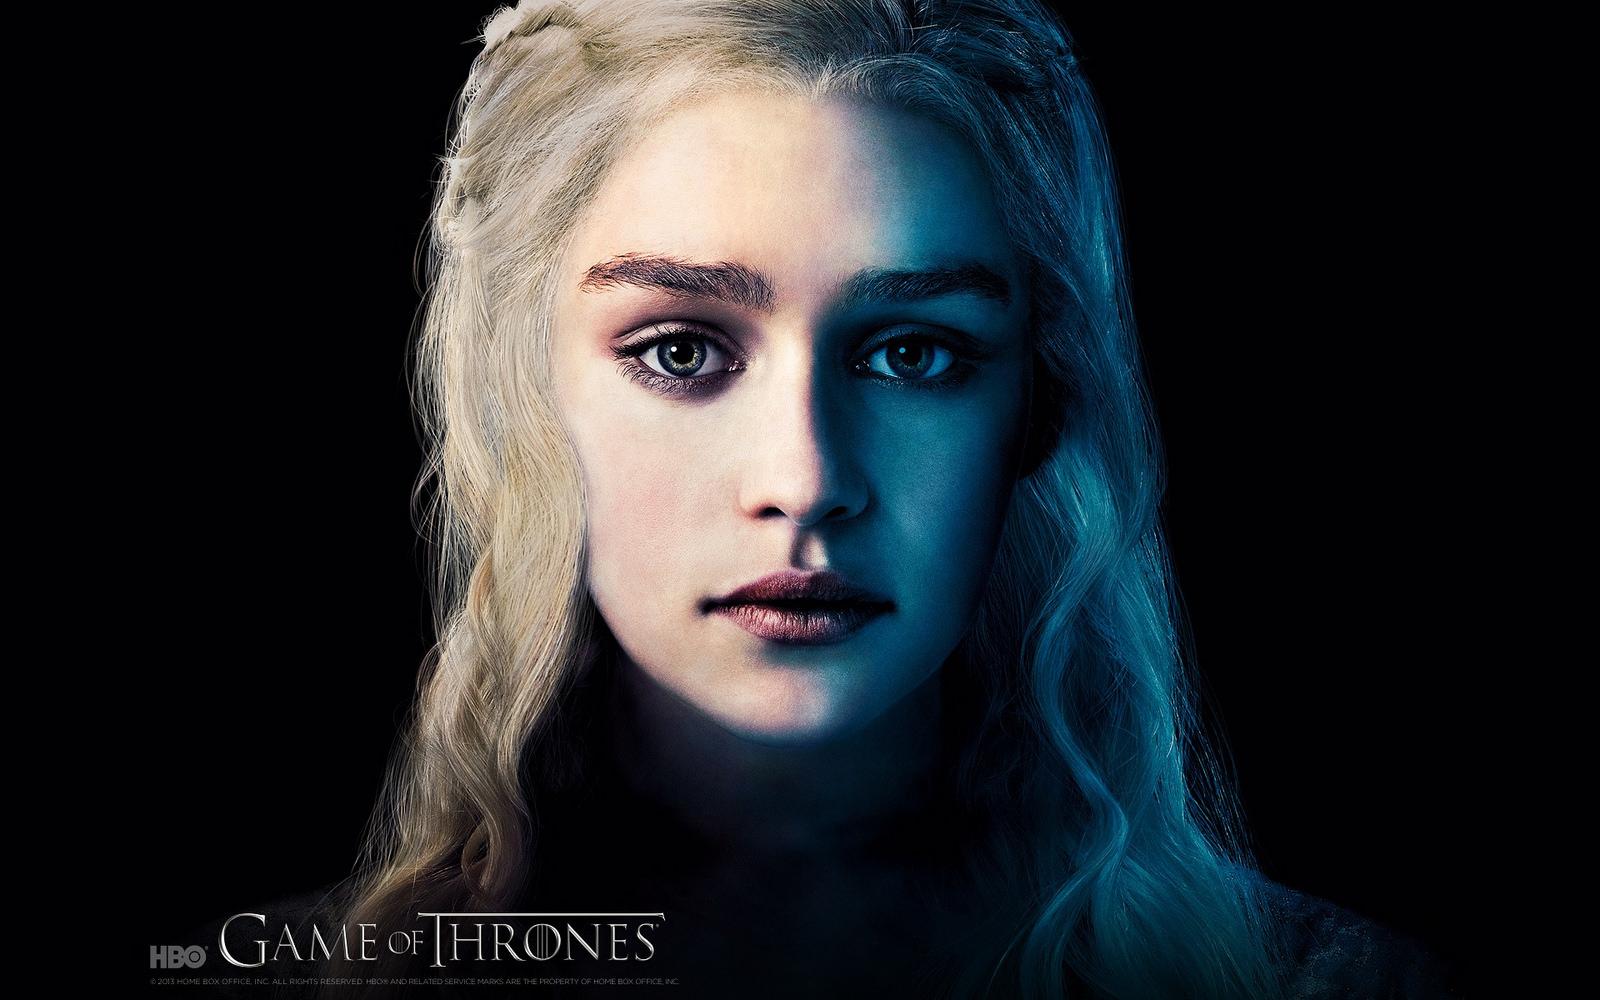 Game of Thrones in the Workplace - Daenerys Targaryen